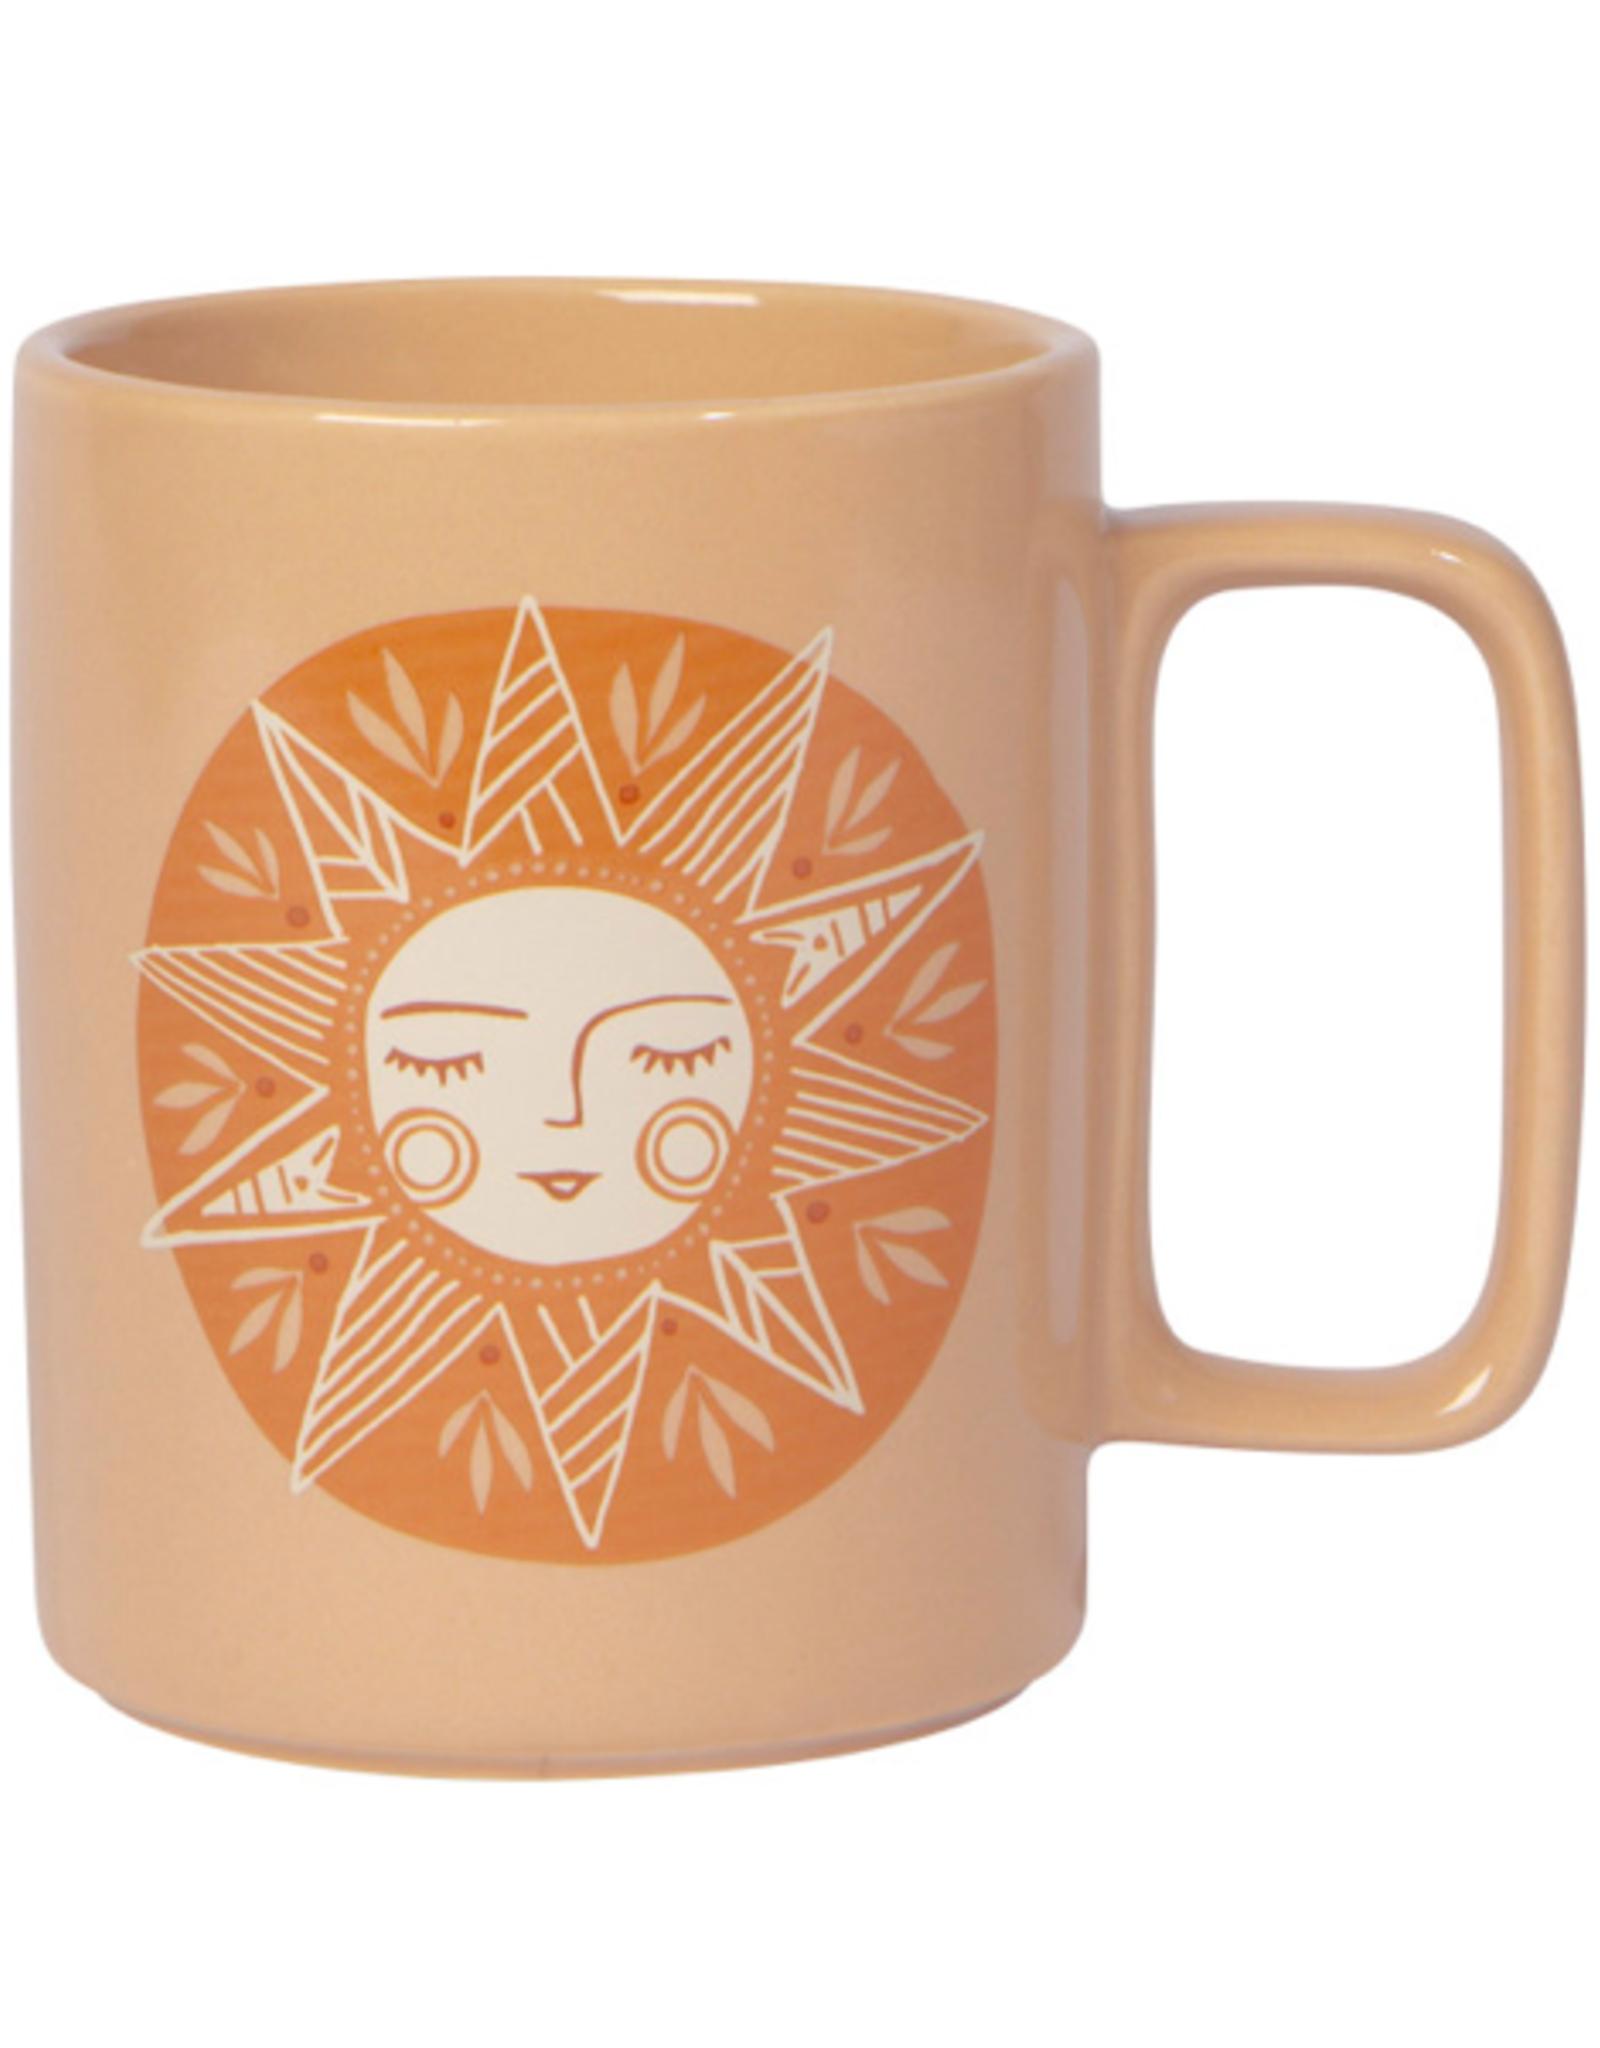 DCA - Mug / Sun, 14oz